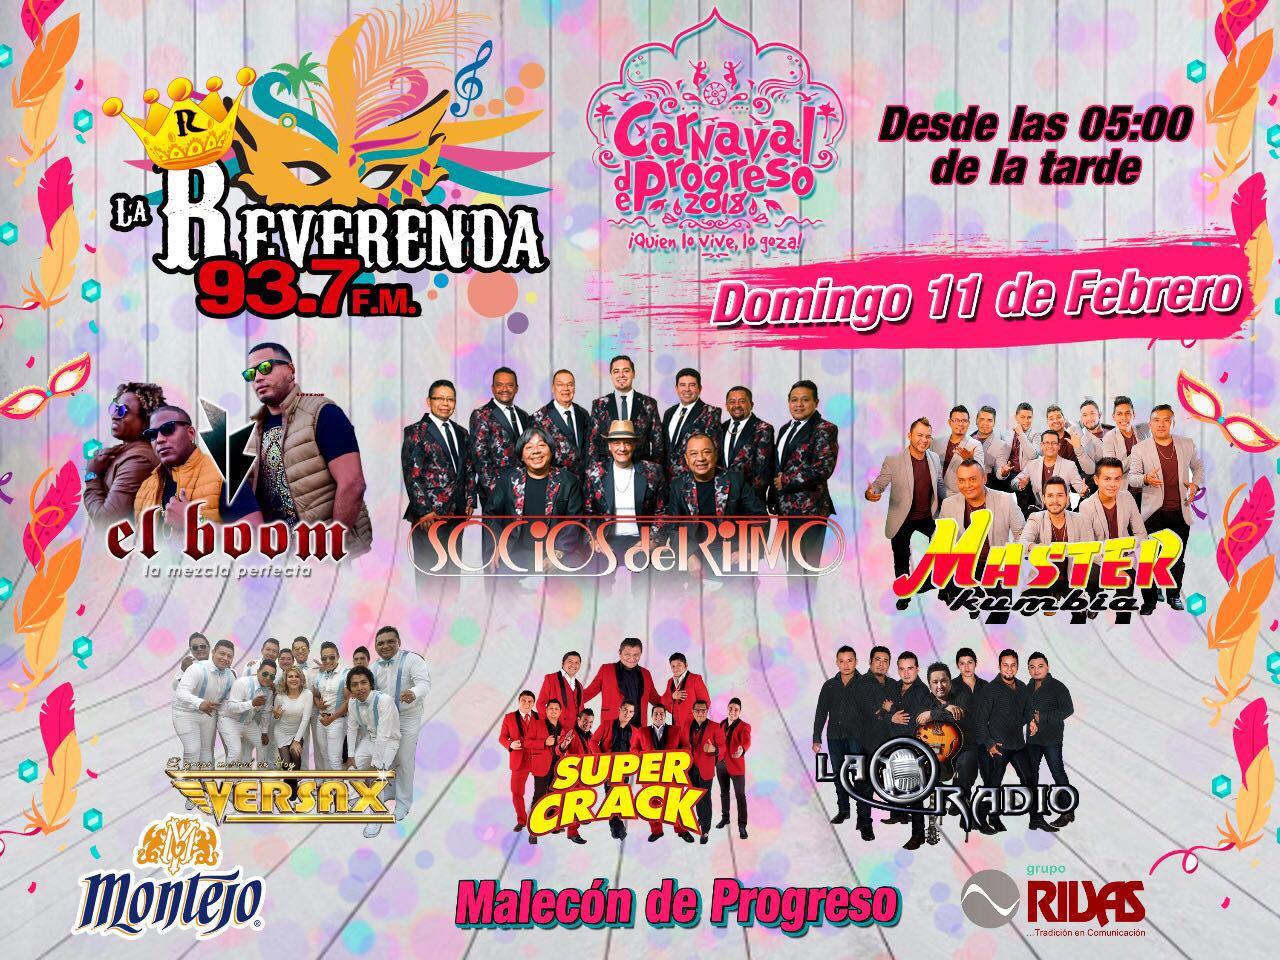 Carnaval de Progreso